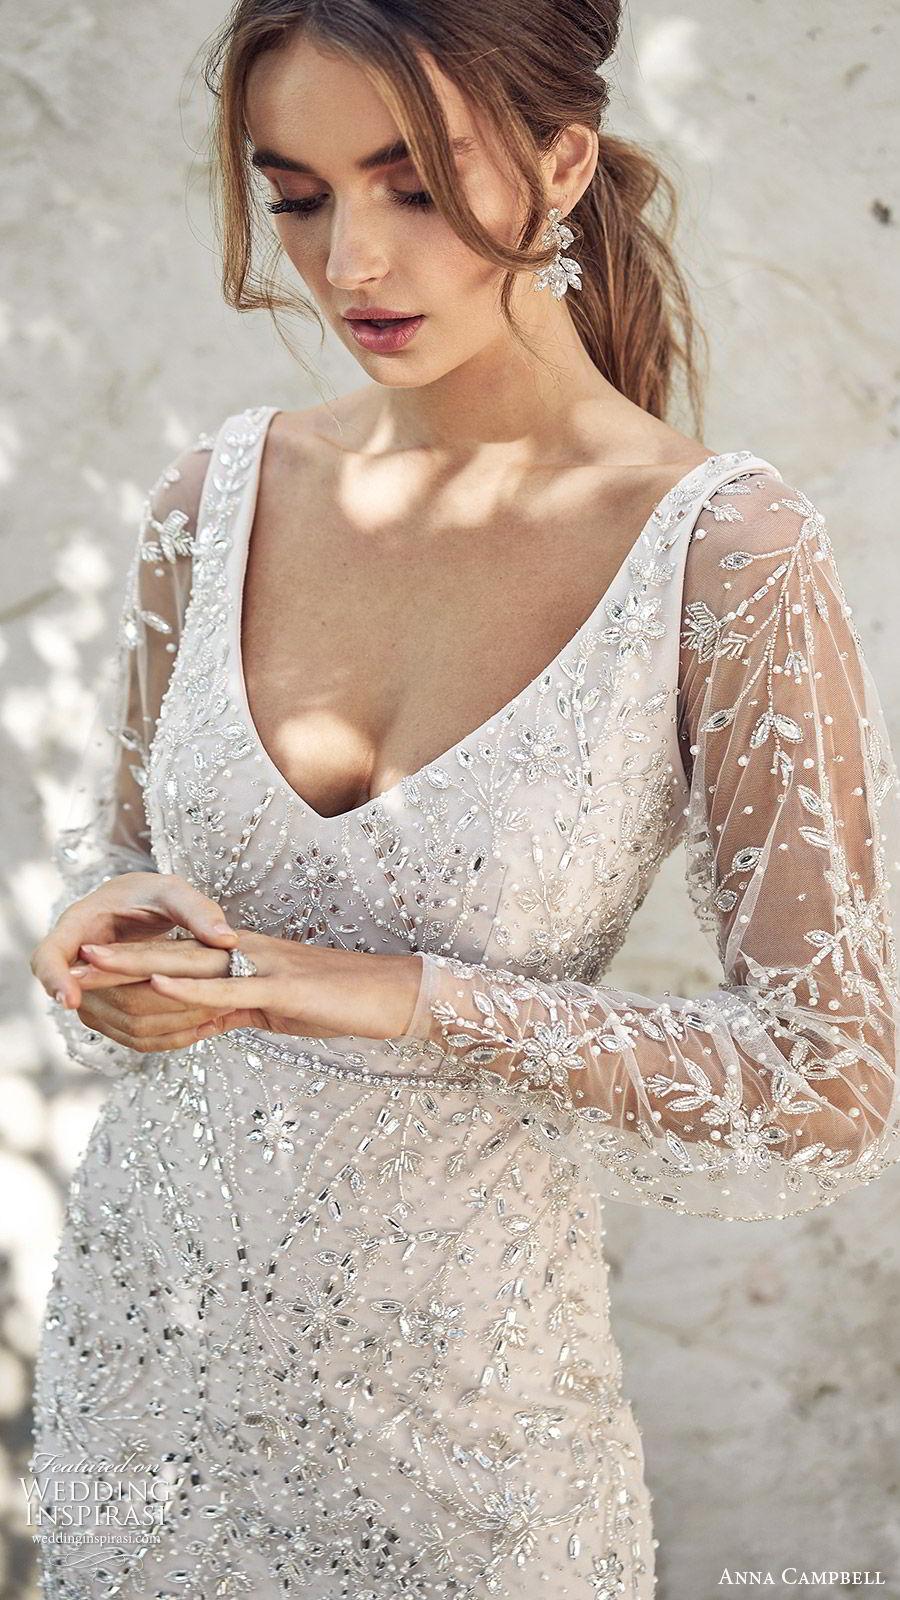 anna campbell 2020 bridal illusion bishop sleeves v neckline fully embellished trumpet mermaid sheath wedding dress (1) glam elegant glitzy scoop back chapel train zv